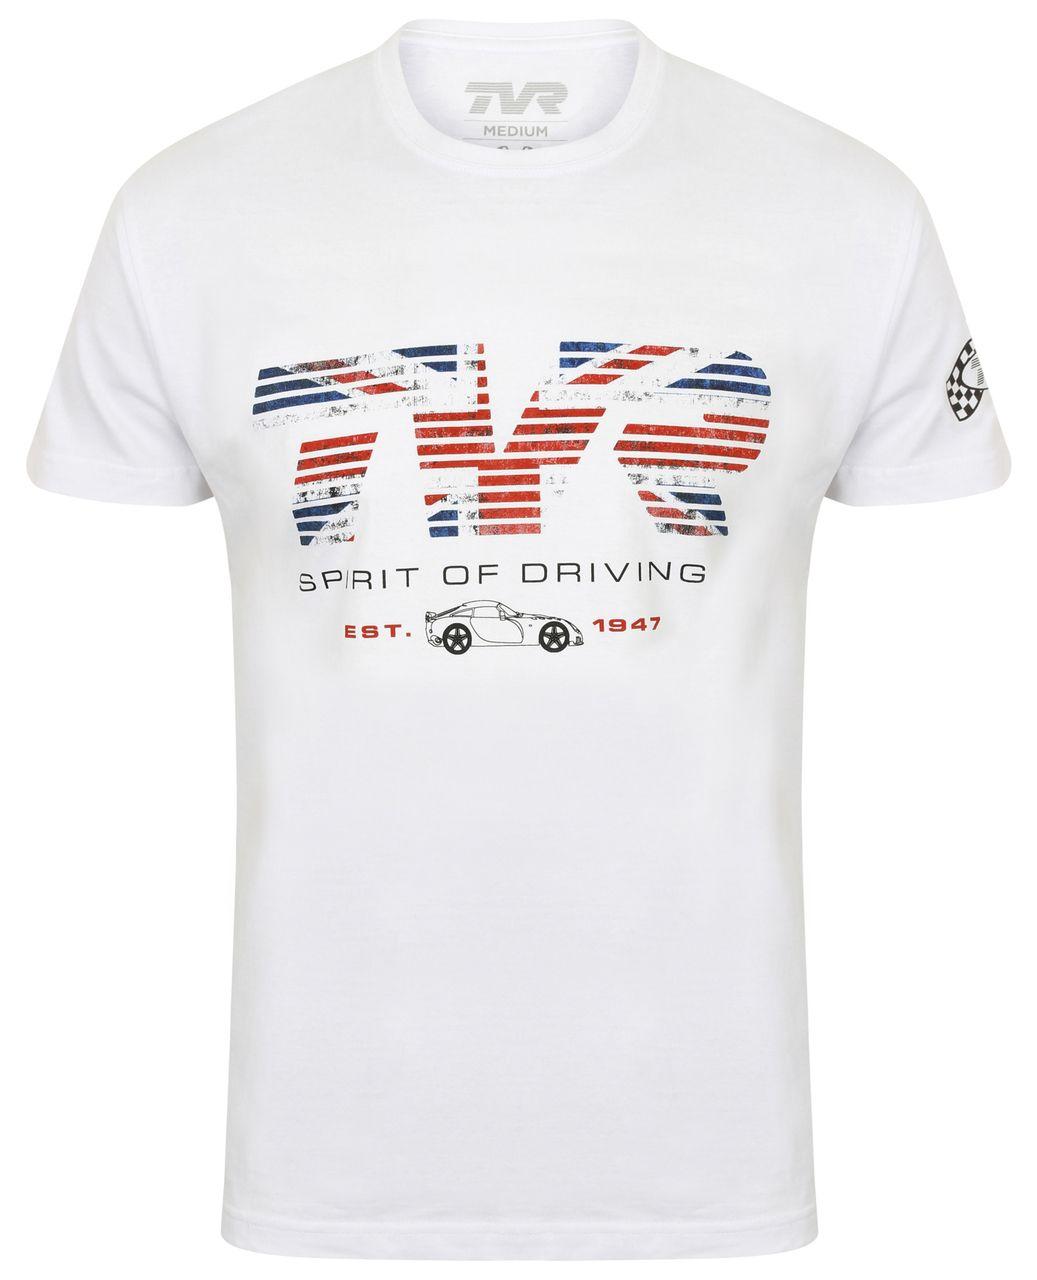 Spirit of Driving Mens TVR T-Shirt Official Merchandise